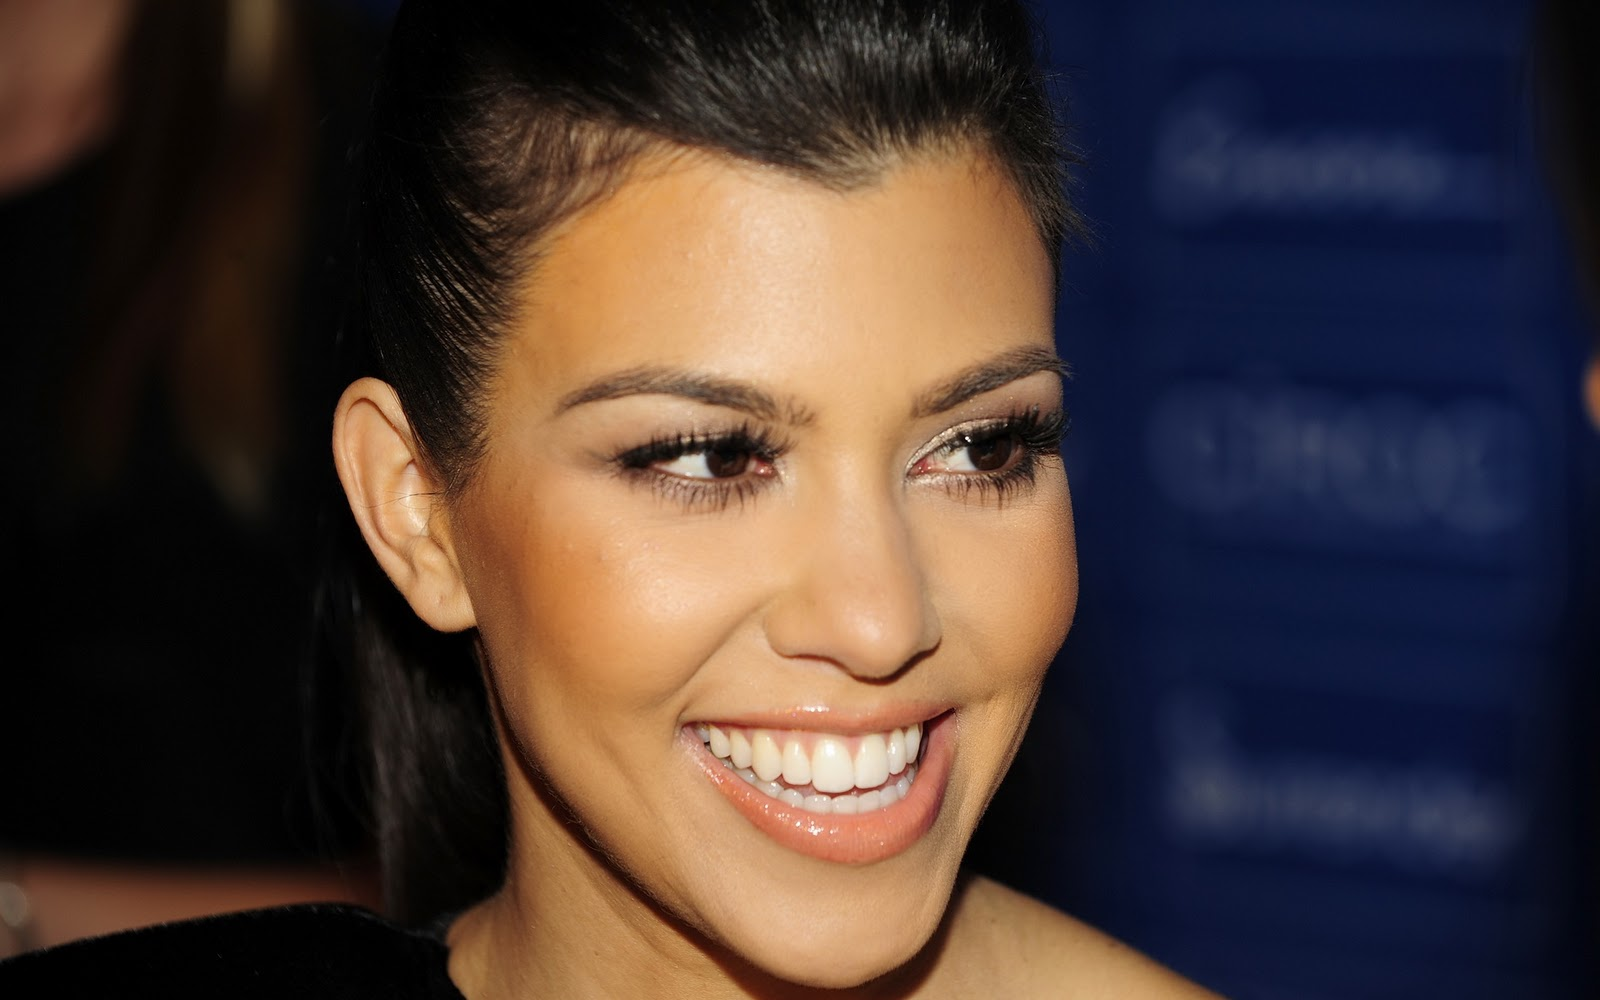 http://3.bp.blogspot.com/-9KH_3bVKl80/TZ2mneN0EdI/AAAAAAAAAB4/oQGcQOSQjKI/s1600/Kourtney-Kardashian2.jpg